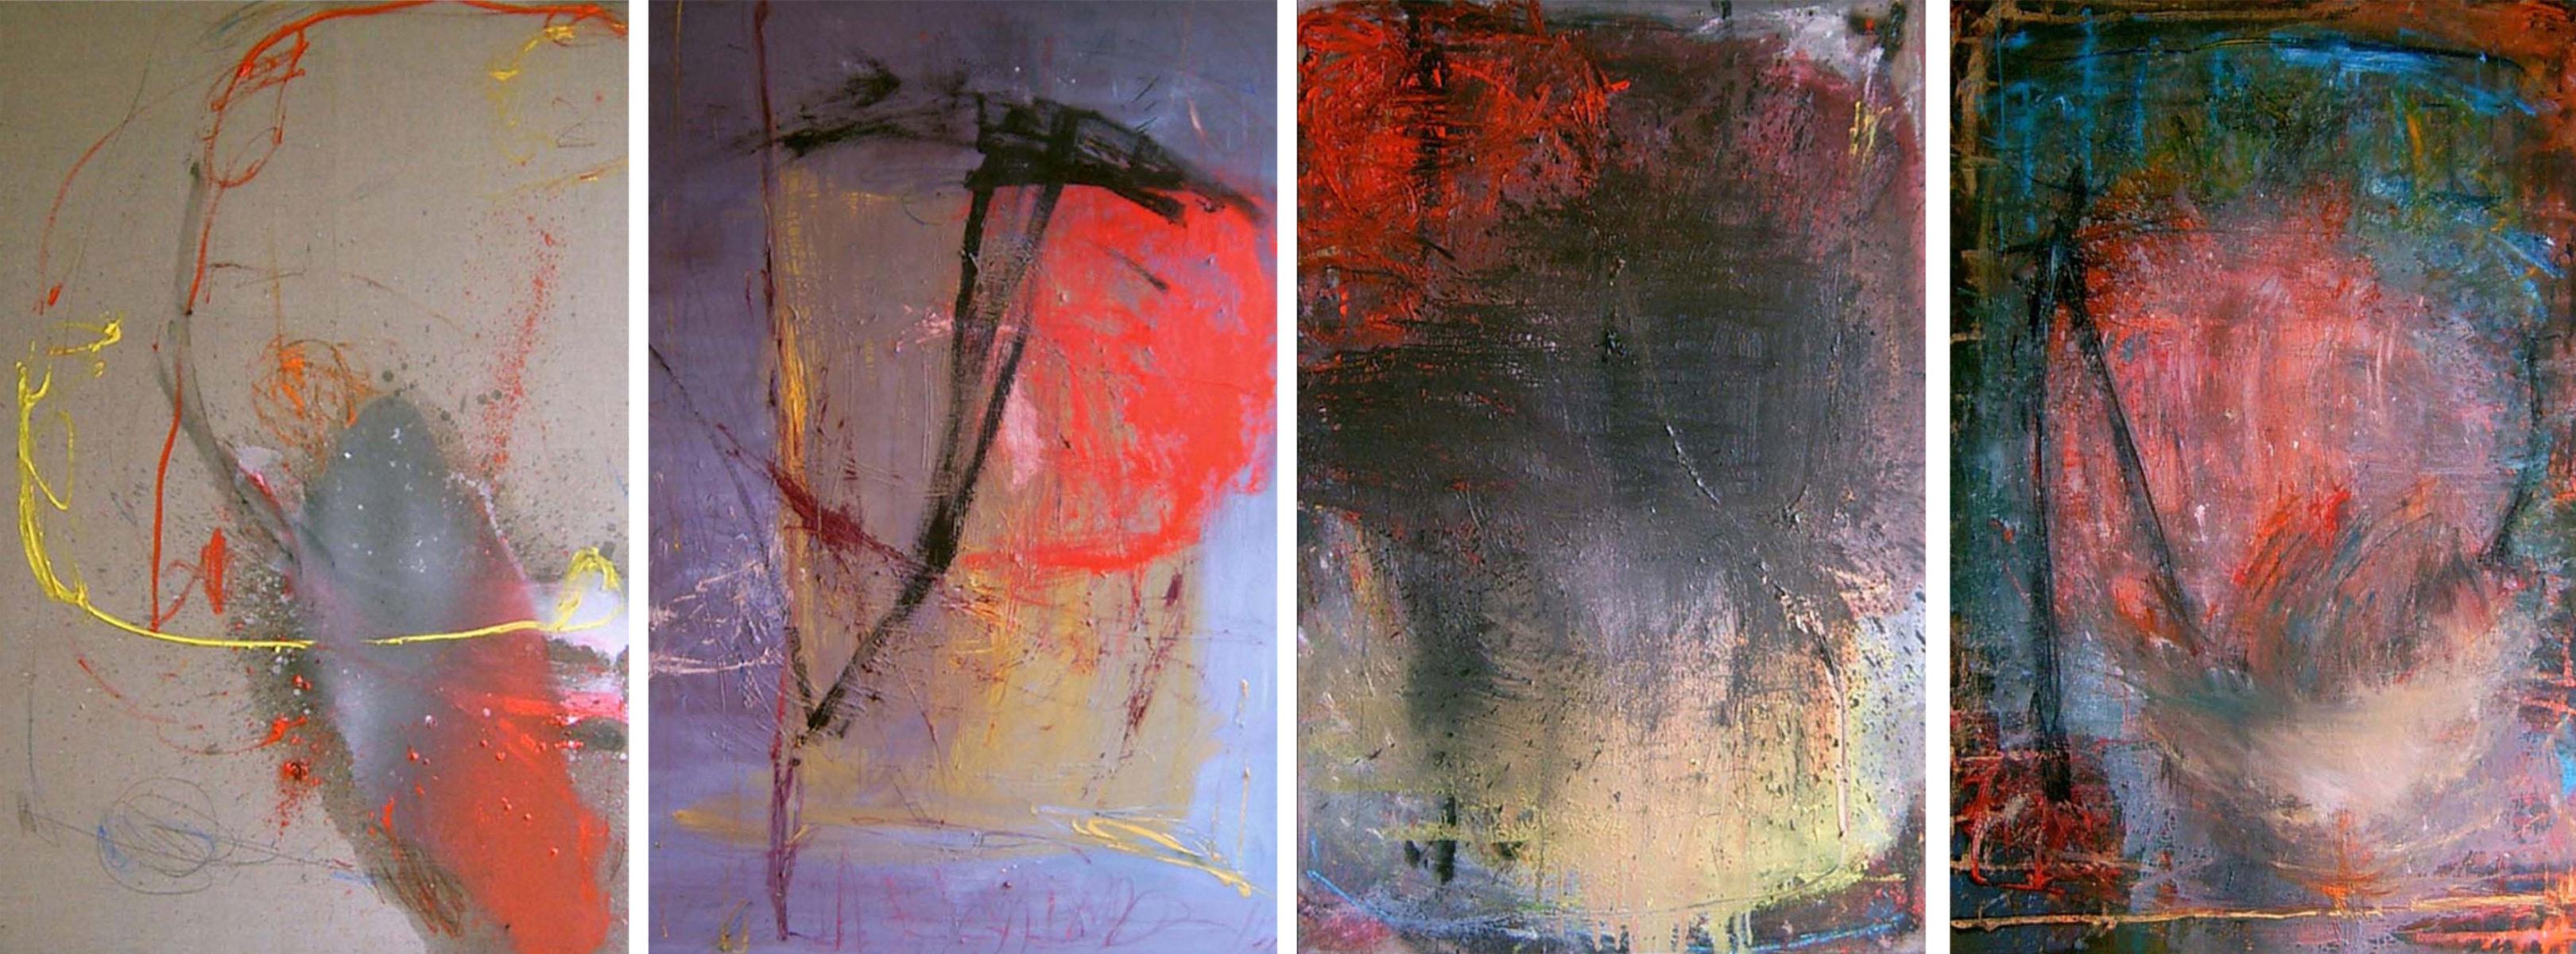 MARC FELD 2006 SUITES URBAINES   Huile  sur toile 520 x 195 cm